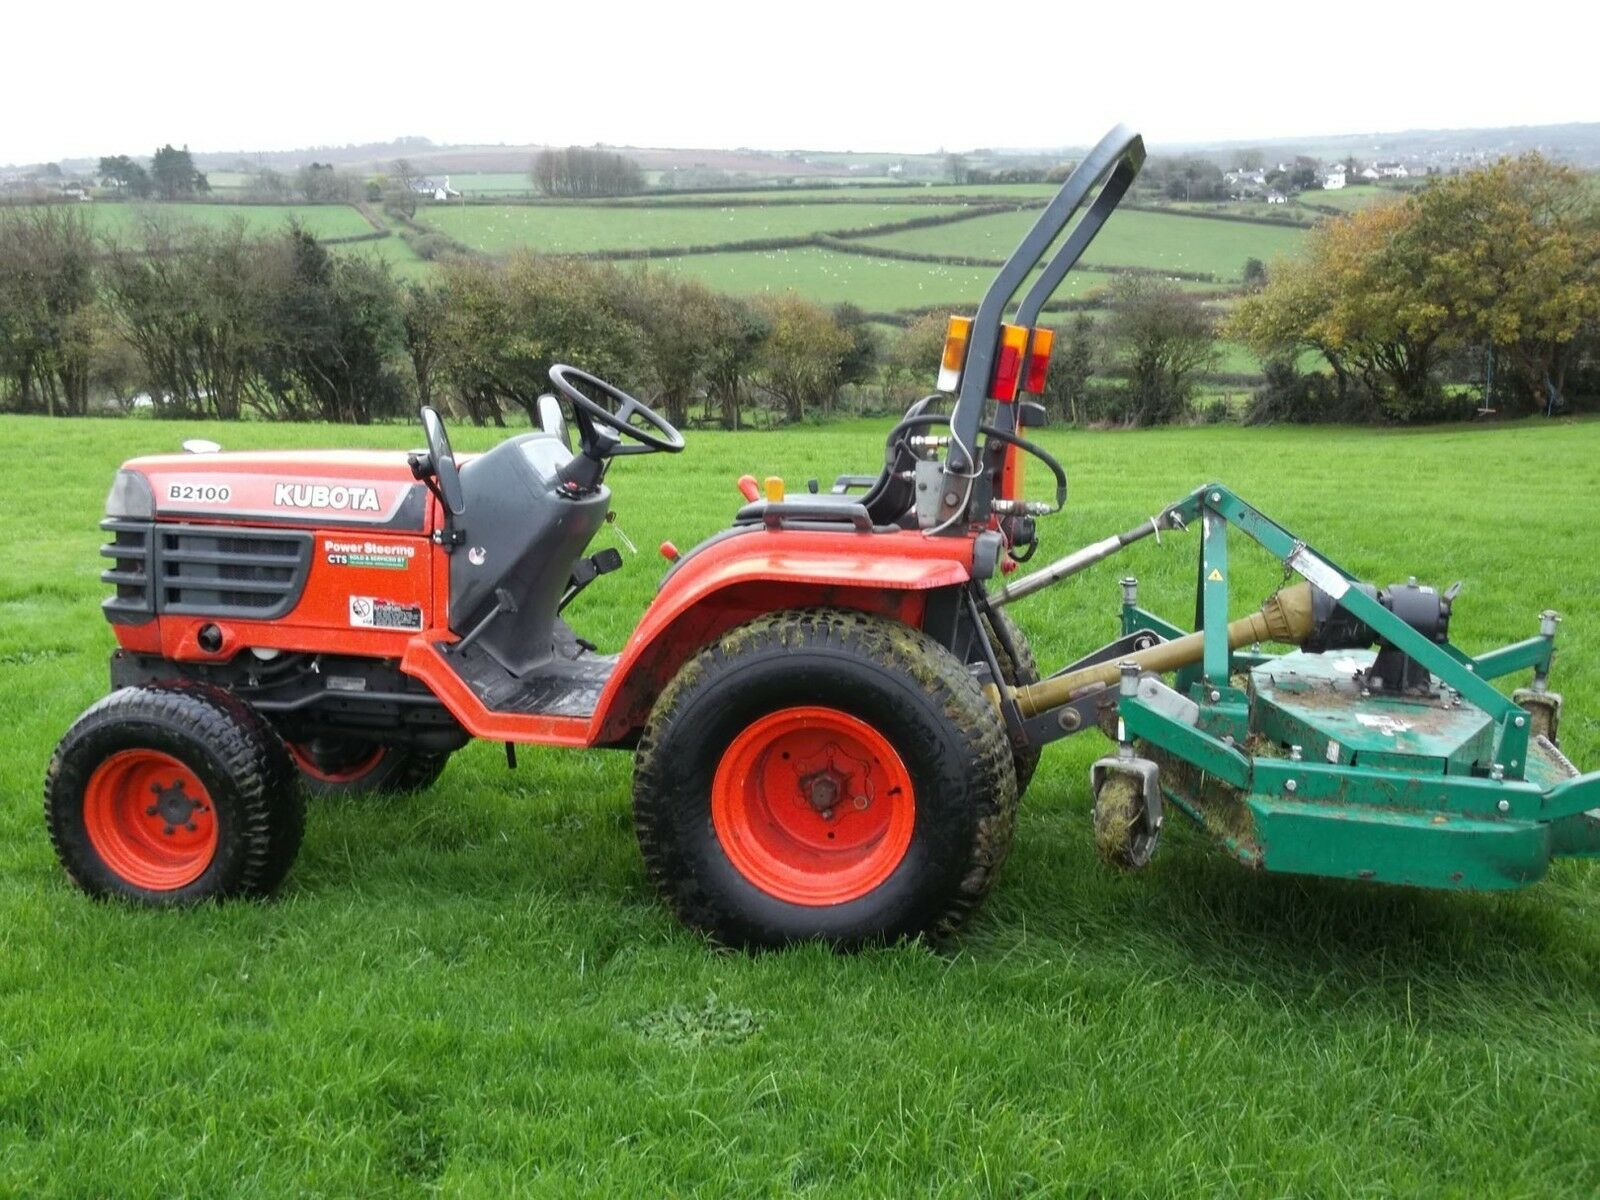 Kubota Tractor Service Manual B 2400 Car Owners B1700 Wiring Diagram B2100 B2400 Tractors Workshop Eur 8 45 Rh Picclick Fr La1944a